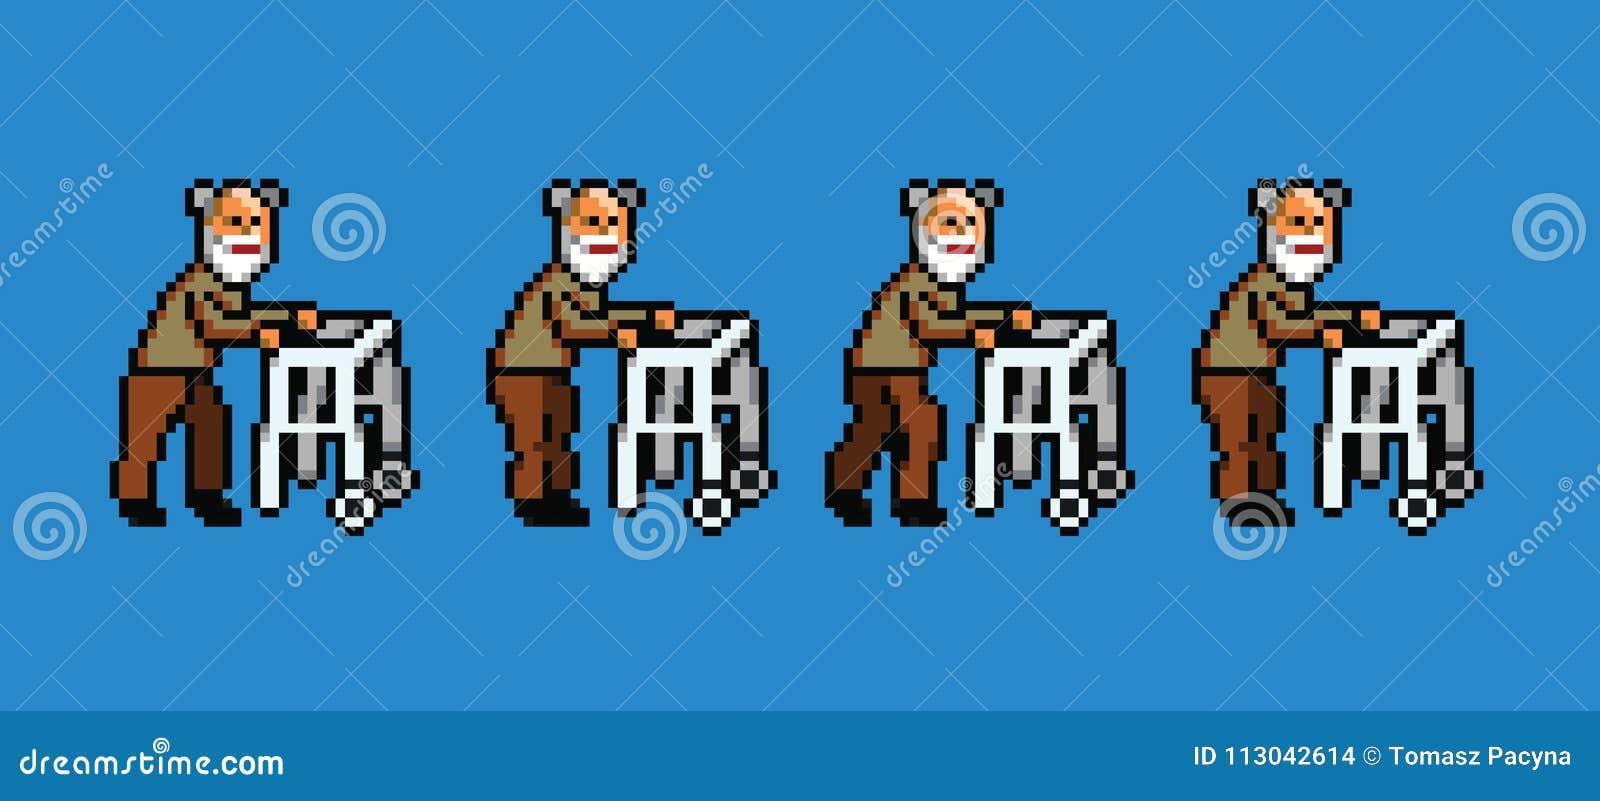 images?q=tbn:ANd9GcQh_l3eQ5xwiPy07kGEXjmjgmBKBRB7H2mRxCGhv1tFWg5c_mWT Pixel Art Walking Animation @koolgadgetz.com.info